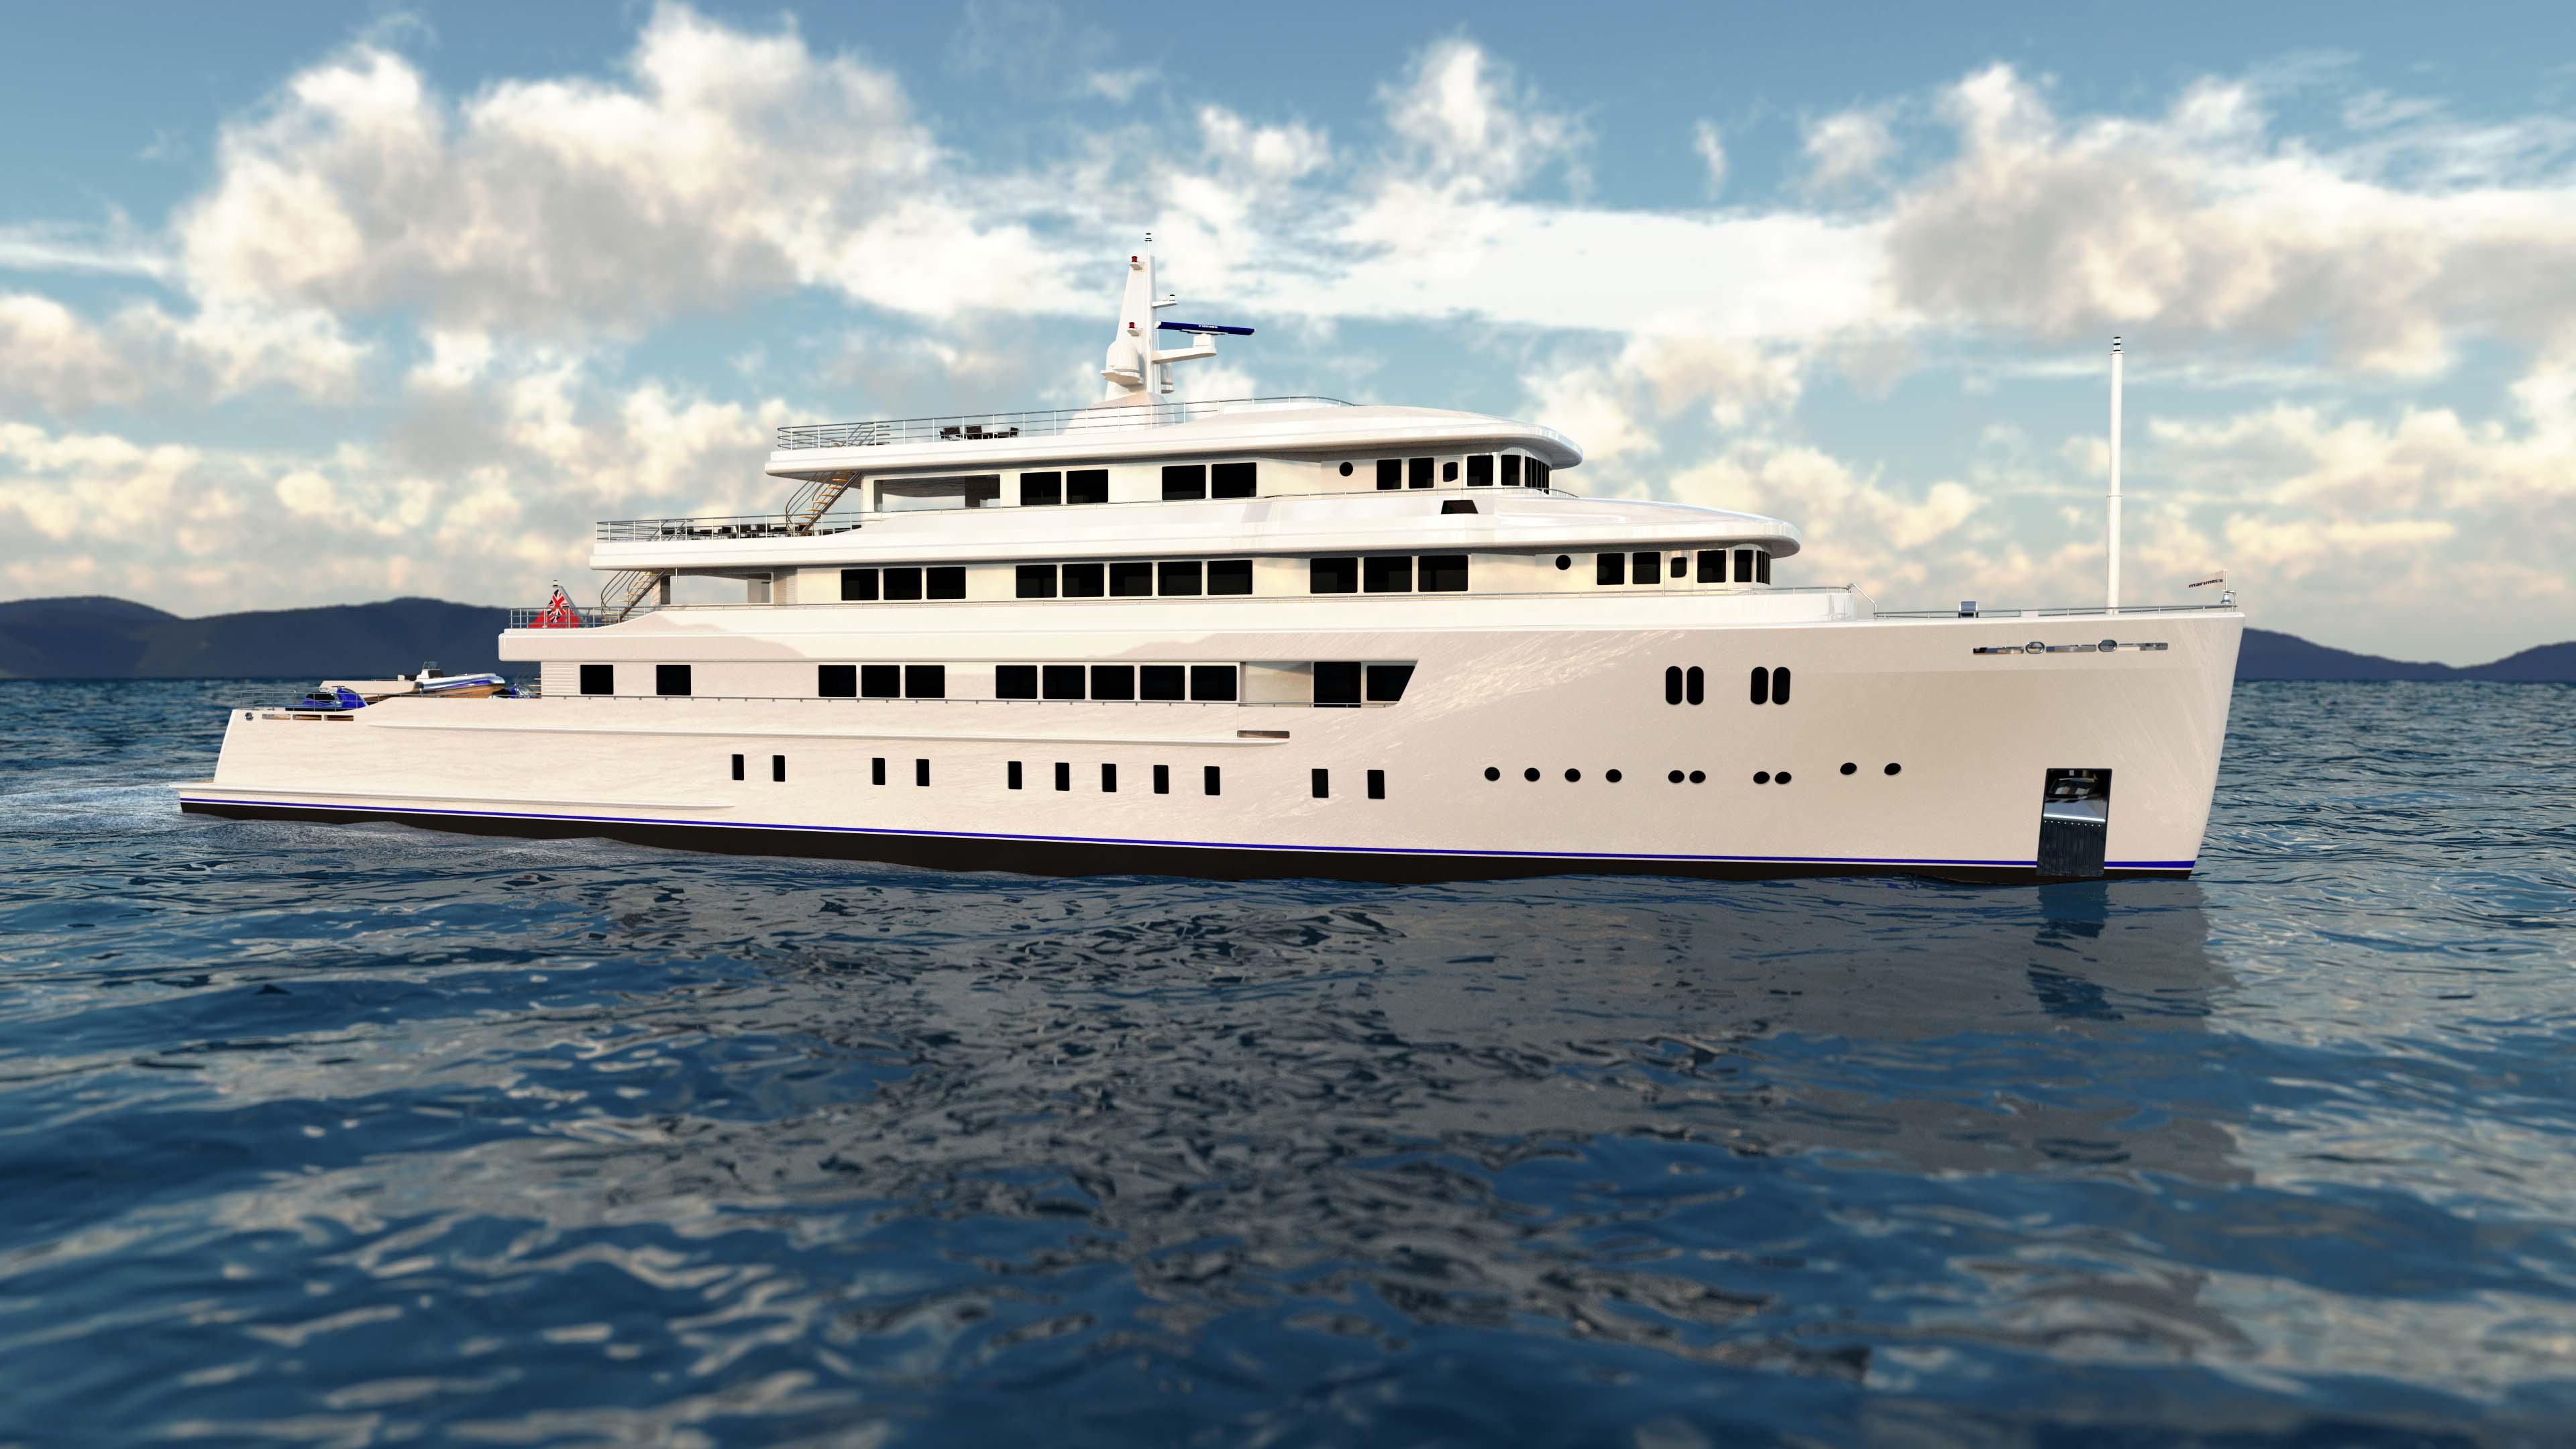 Manta 65 Explorer Yacht Superyacht Marimecs Eurocraft Hot Lab Italy Netherlands Dutch